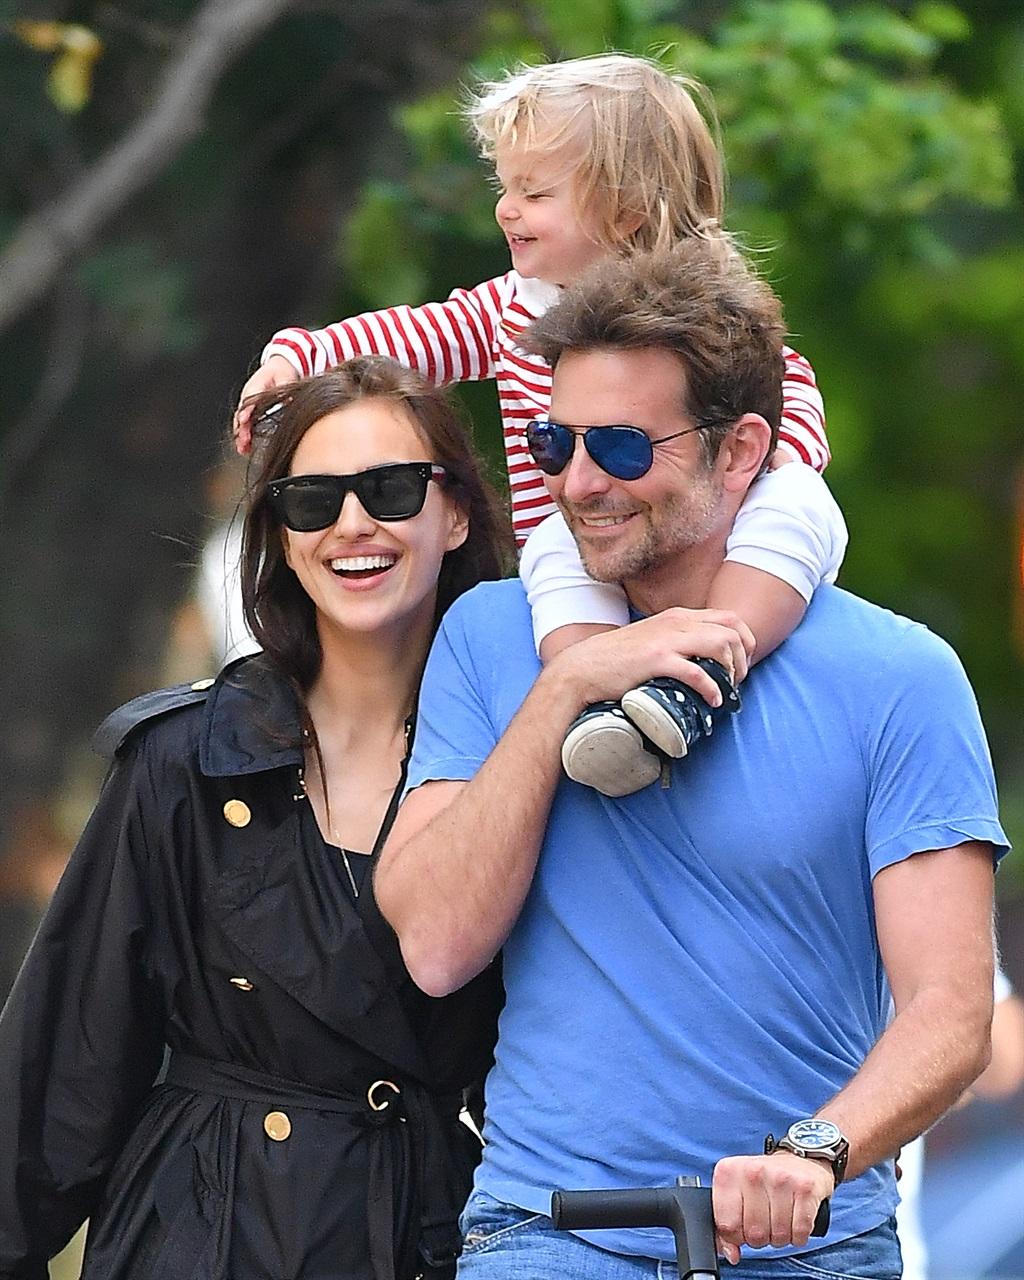 Forum on this topic: Bradley Cooper festeggia con fidanzata e famiglia, bradley-cooper-festeggia-con-fidanzata-e-famiglia/